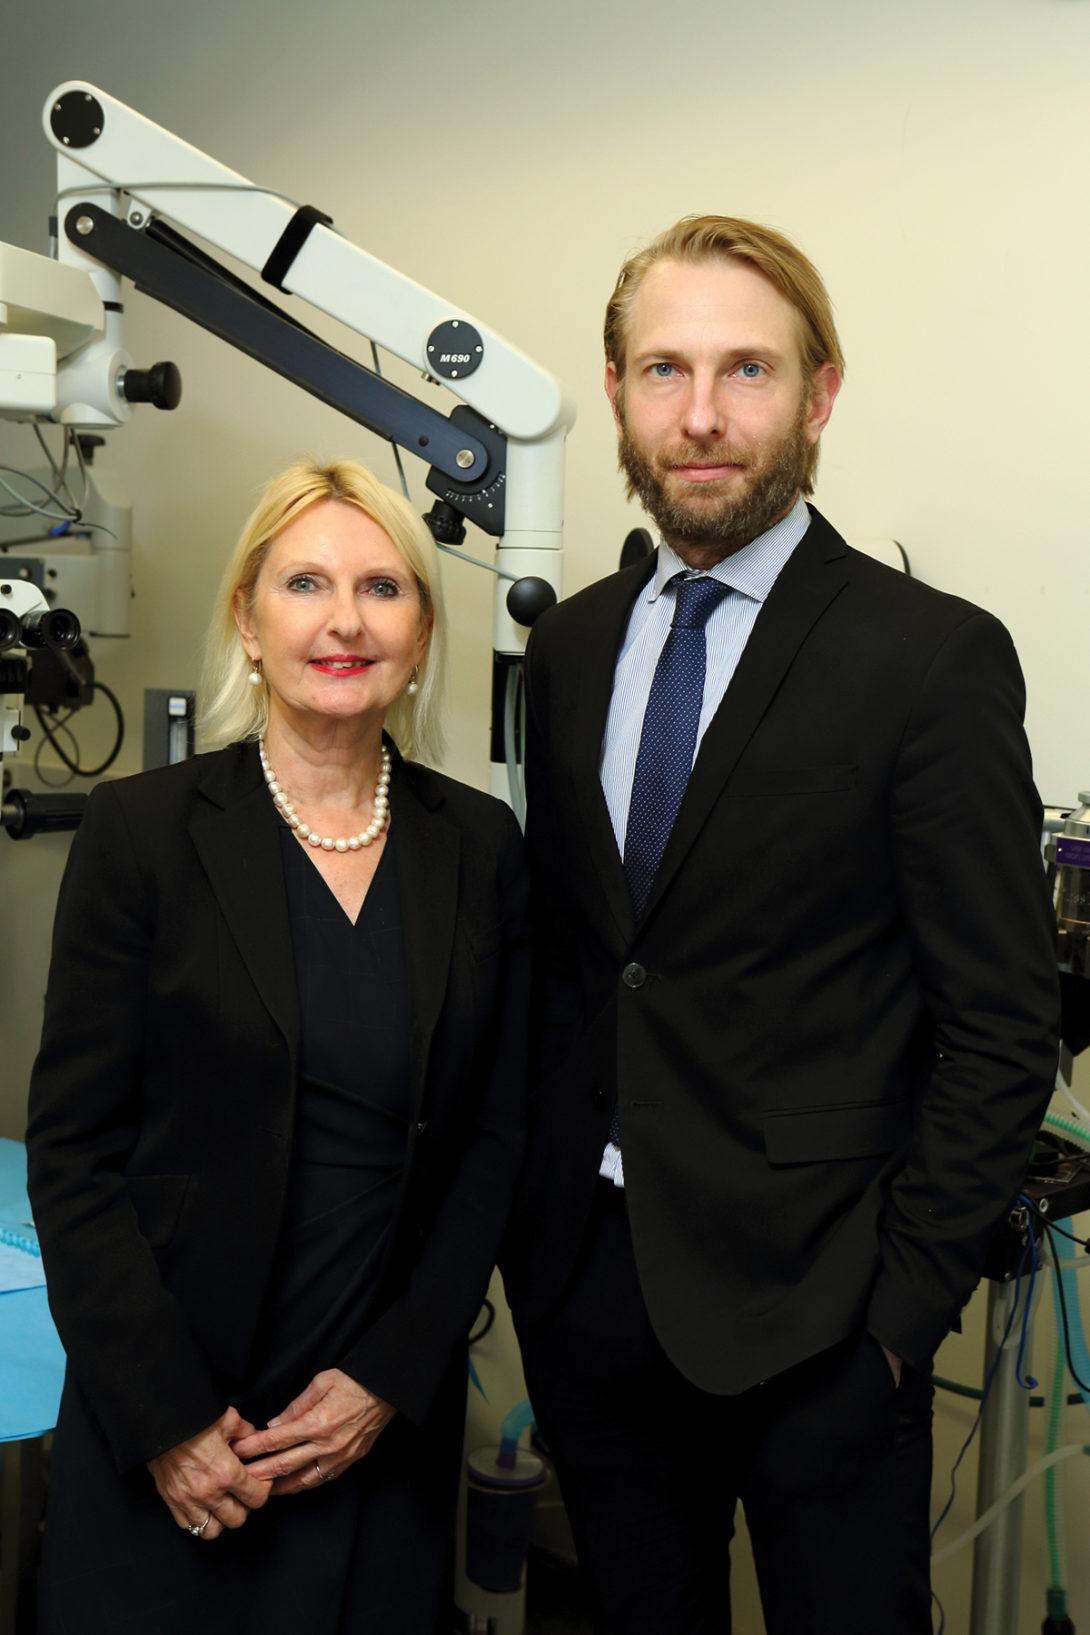 Drs. Maria and Kris Siemionow.